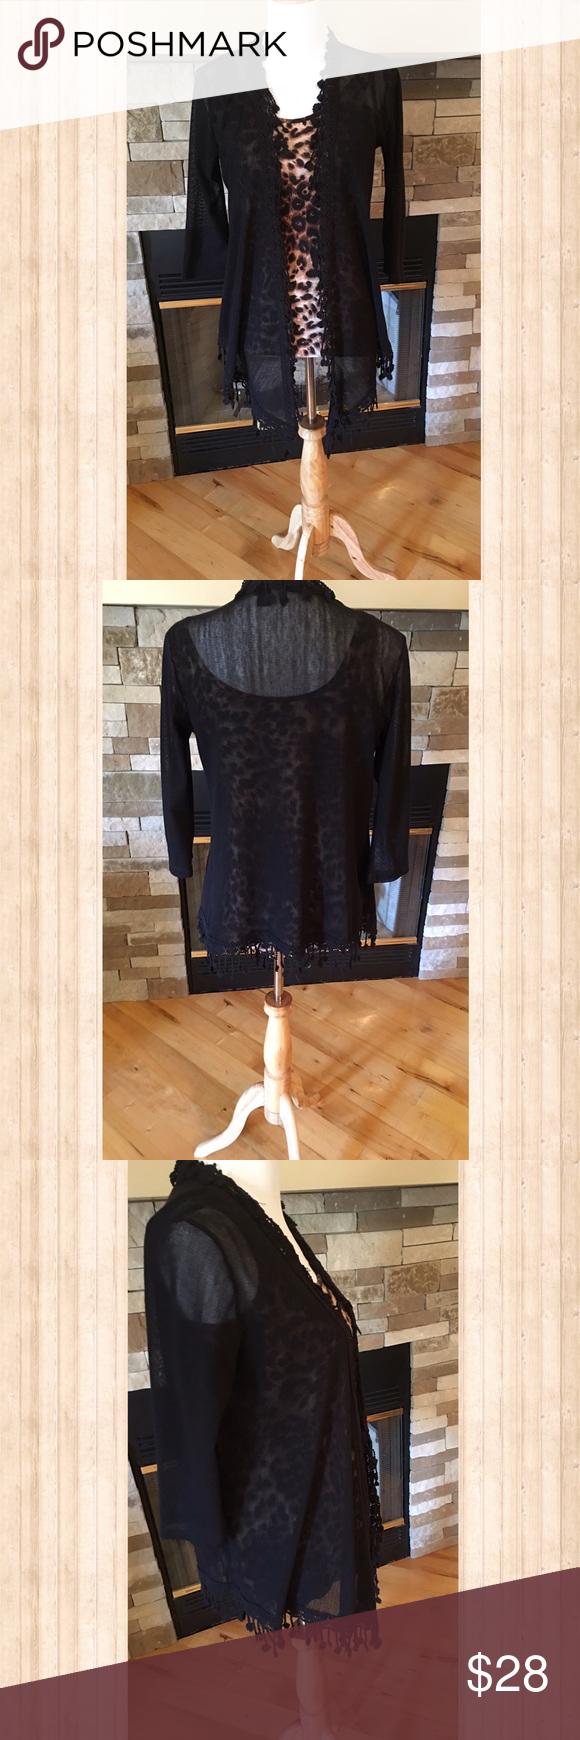 Daytrip Black Drape Cardigan | Sheer material, Layering and Floral